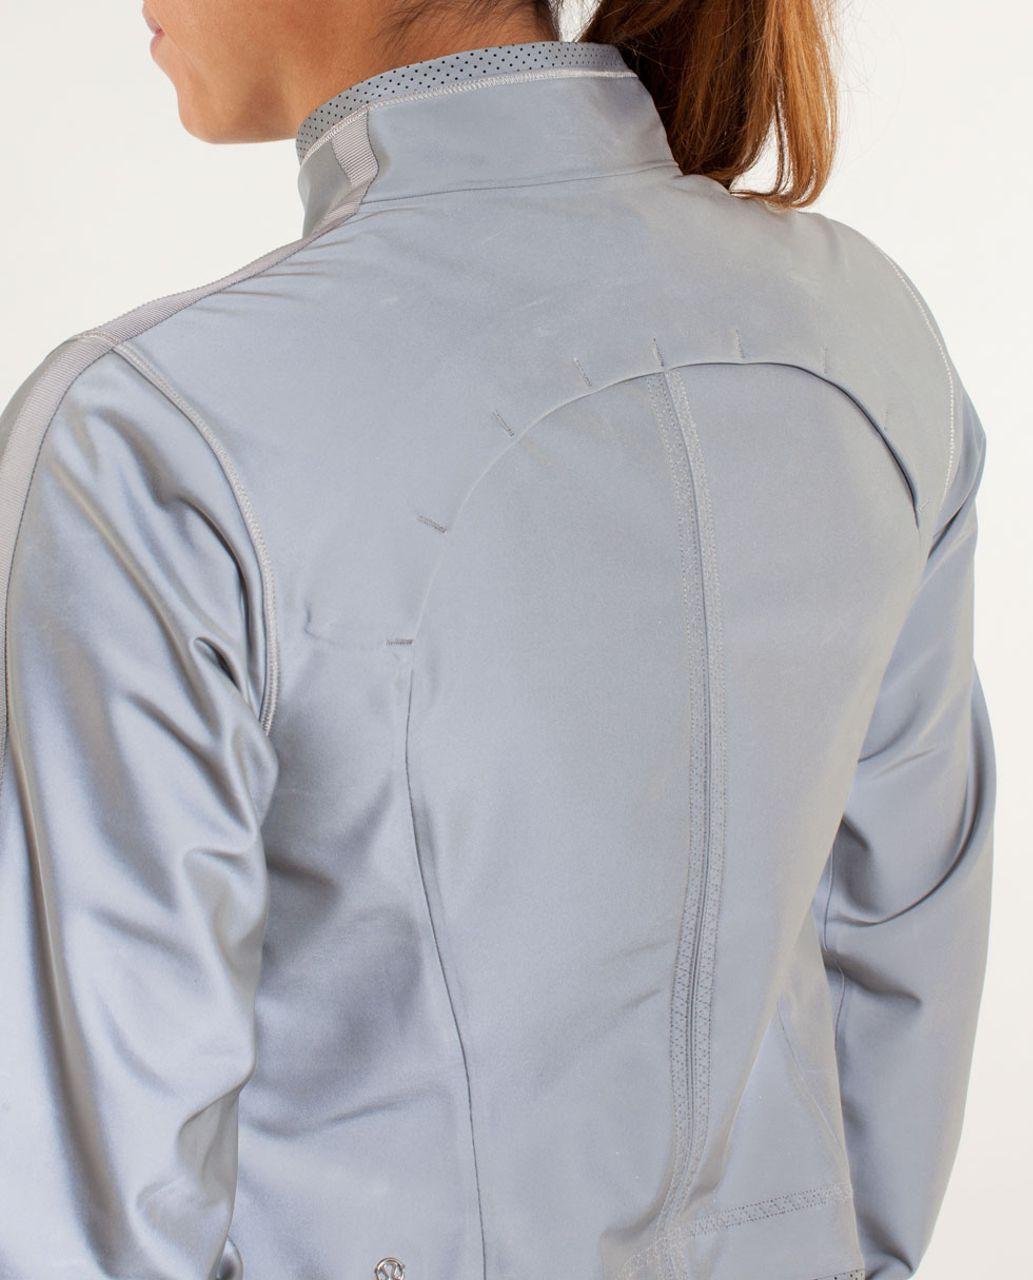 Lululemon Run:  Reflective Jacket - Silver